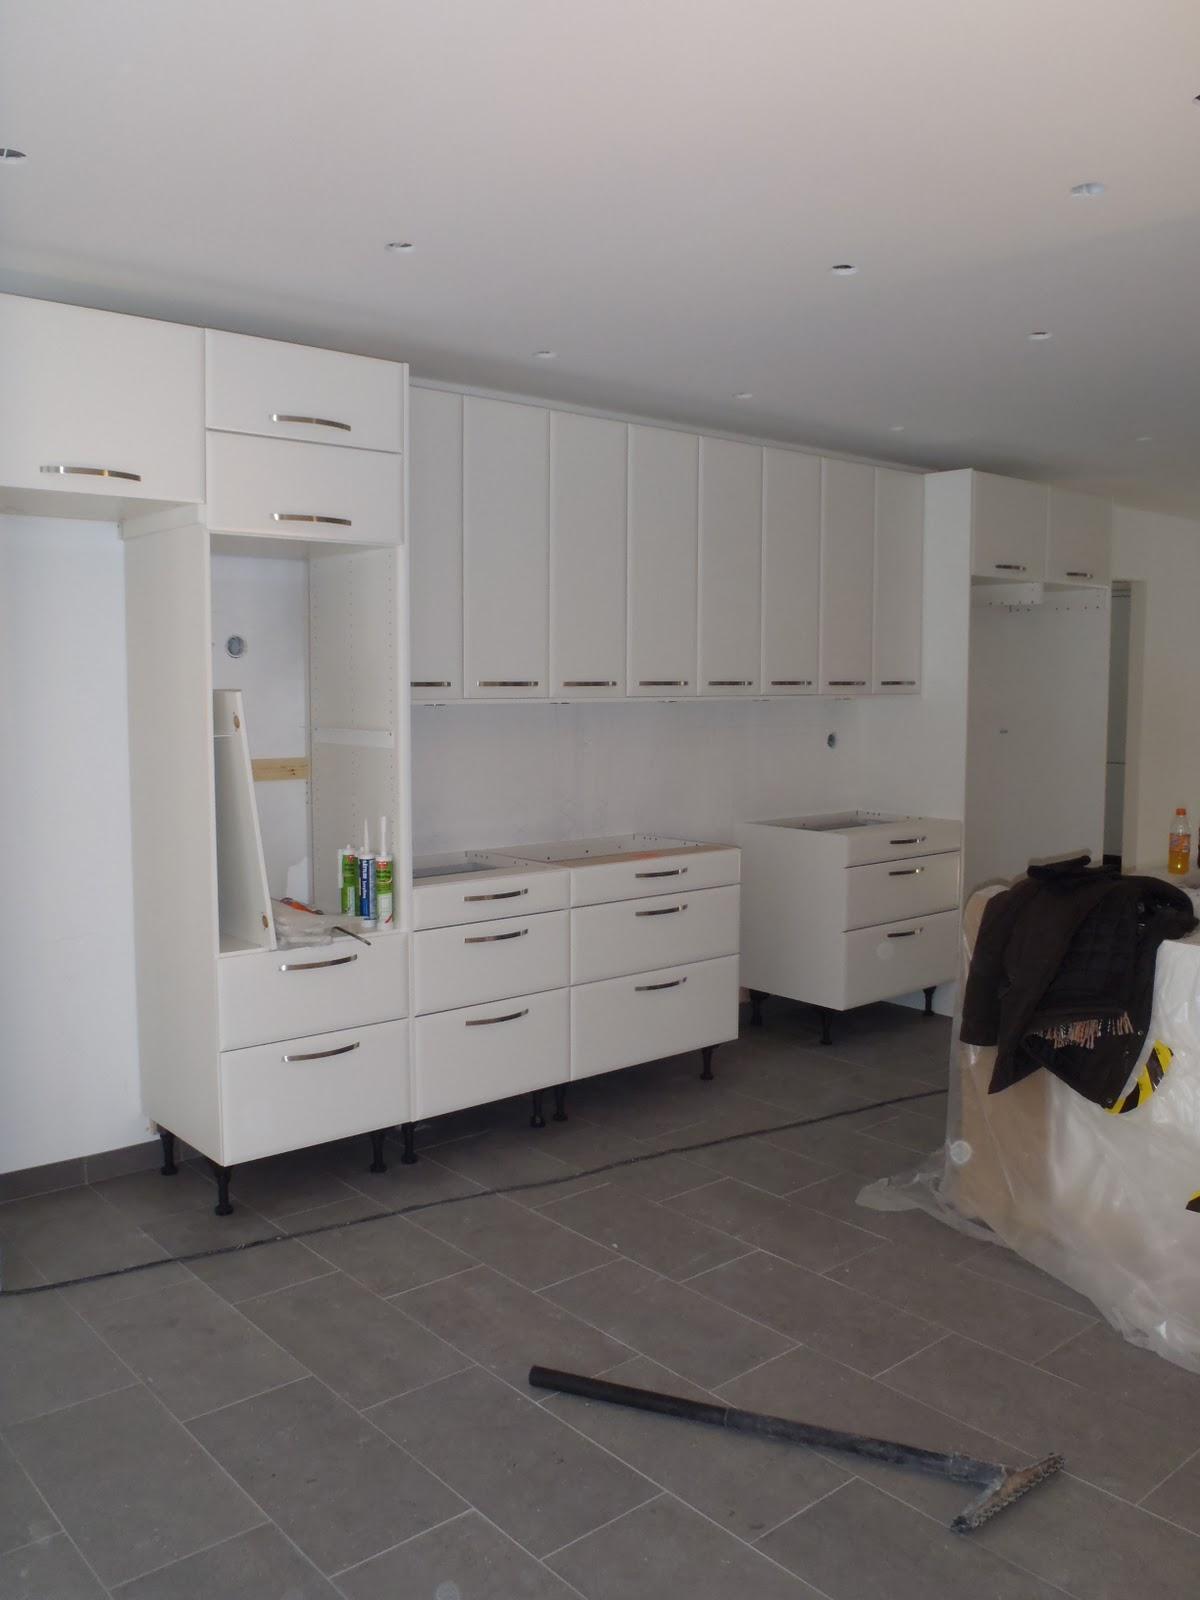 am dreamhouse ek parkett k k badrum. Black Bedroom Furniture Sets. Home Design Ideas